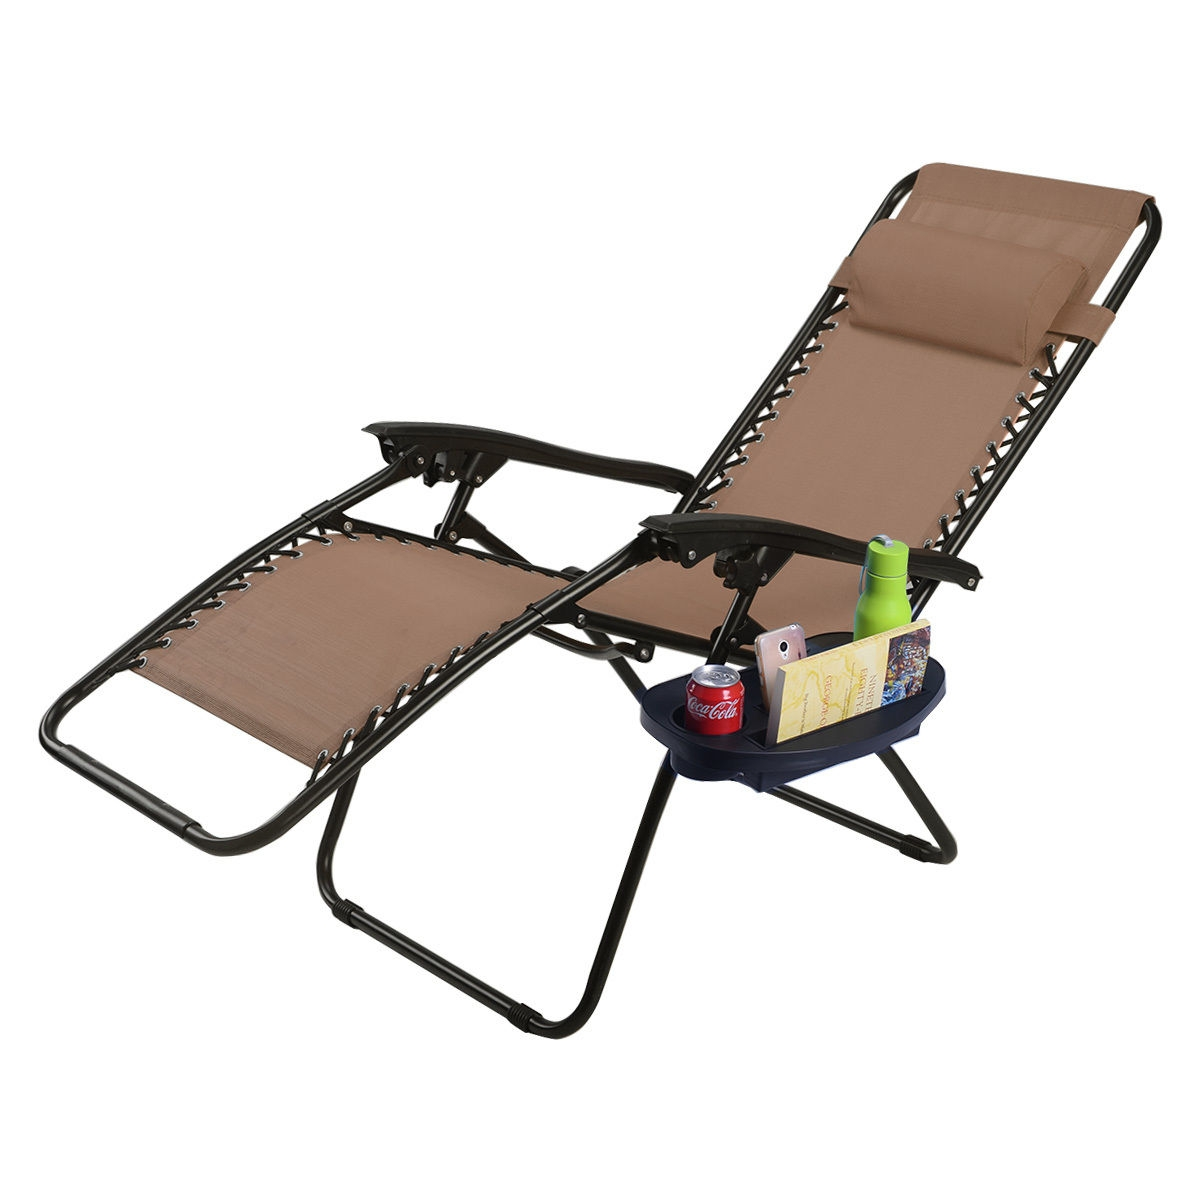 Outdoor Folding Zero Gravity Reclining Lounge Chair w/ Utility Tray